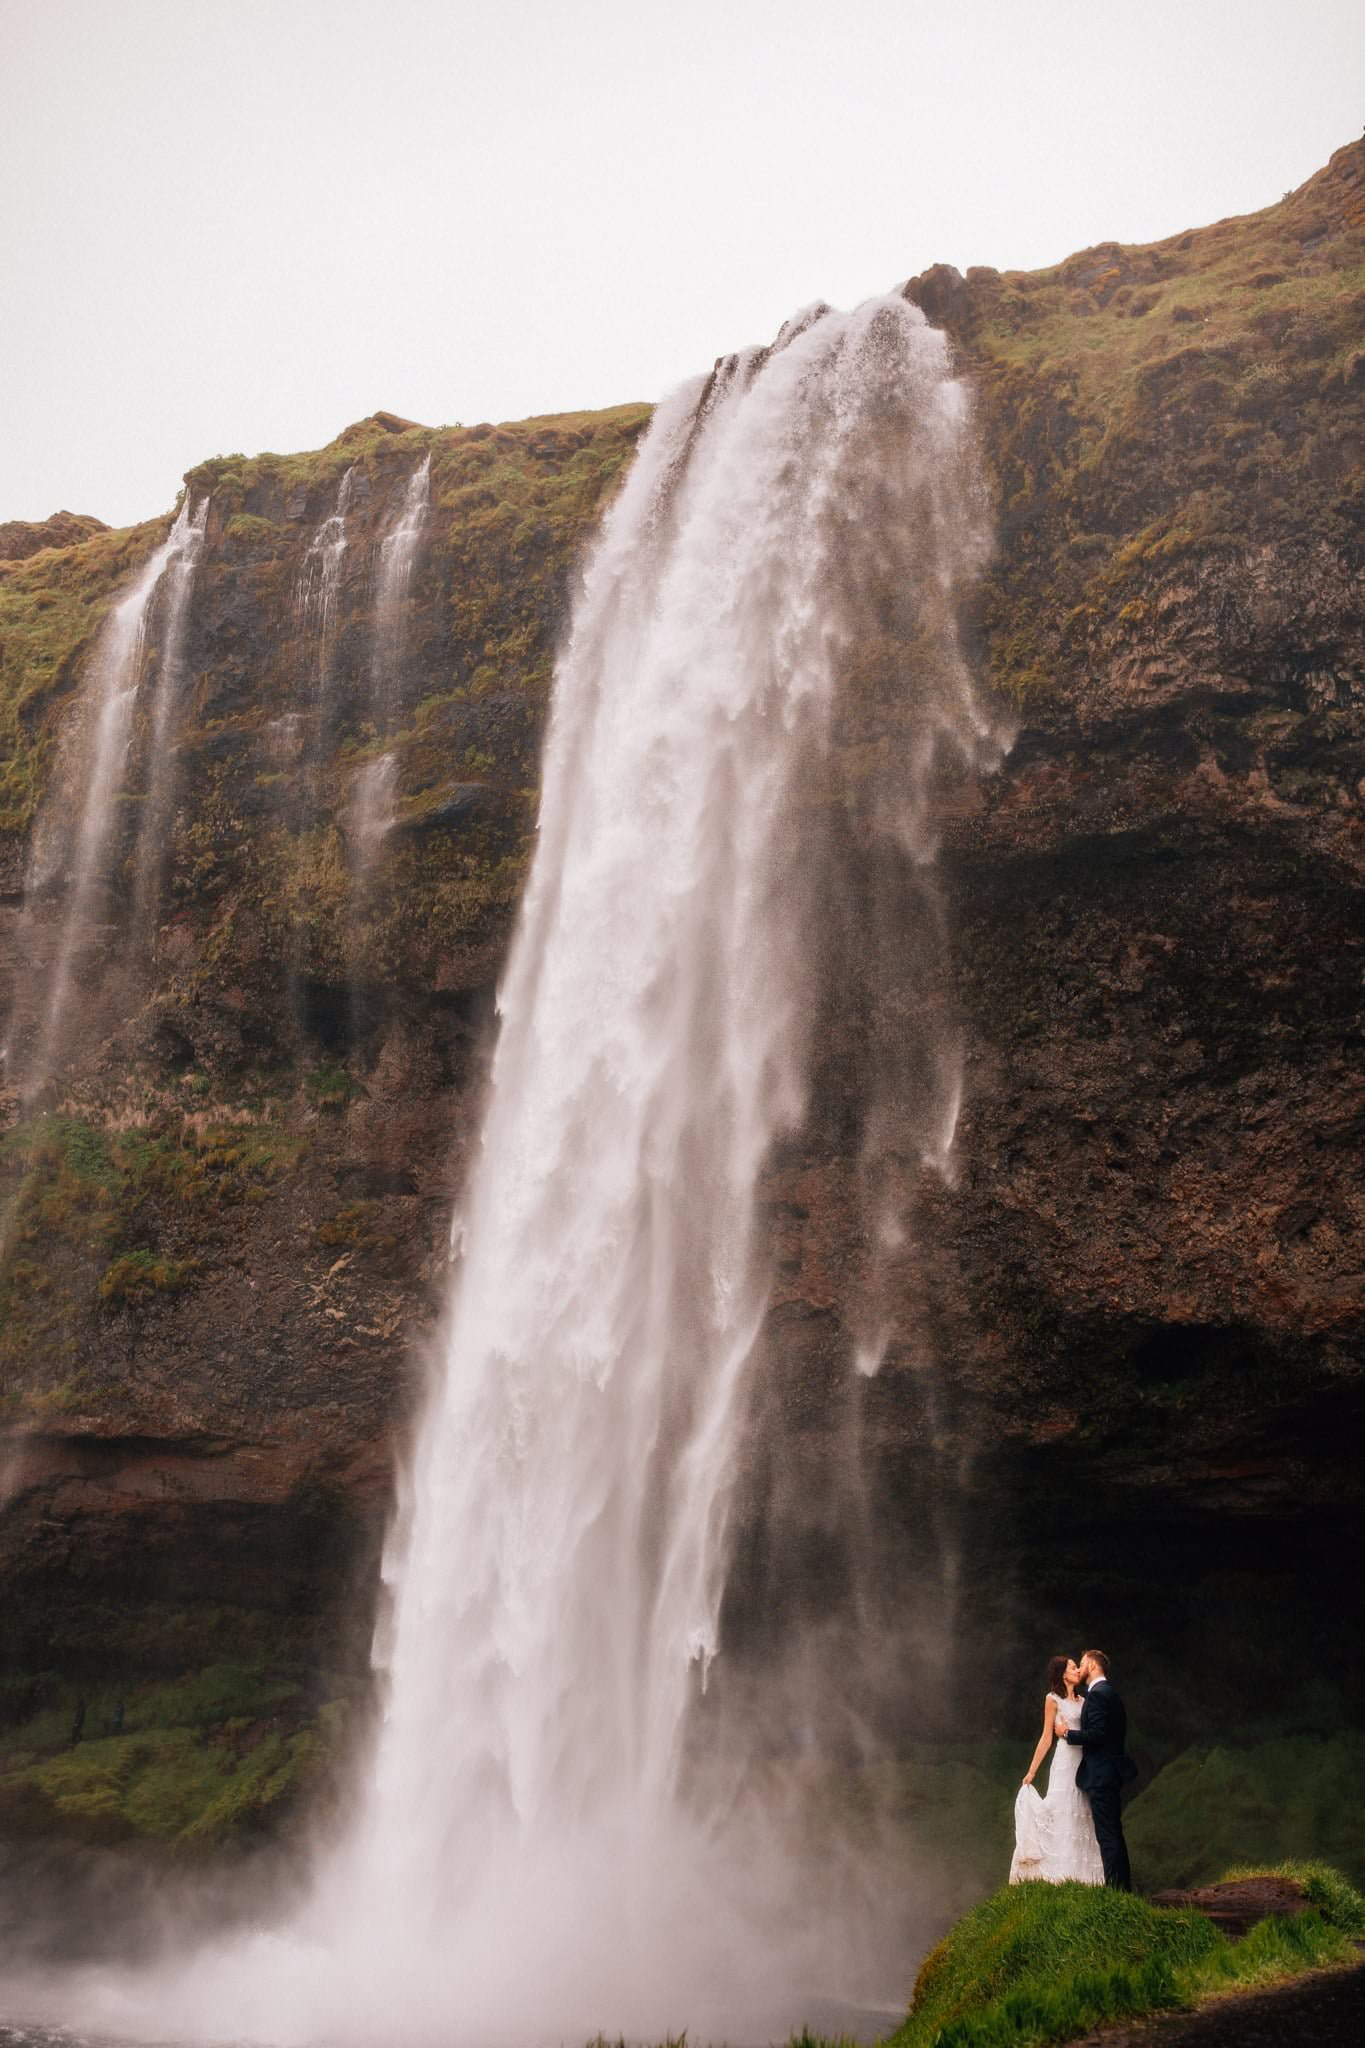 Wodospad Islandia Sesja Pary Młodej